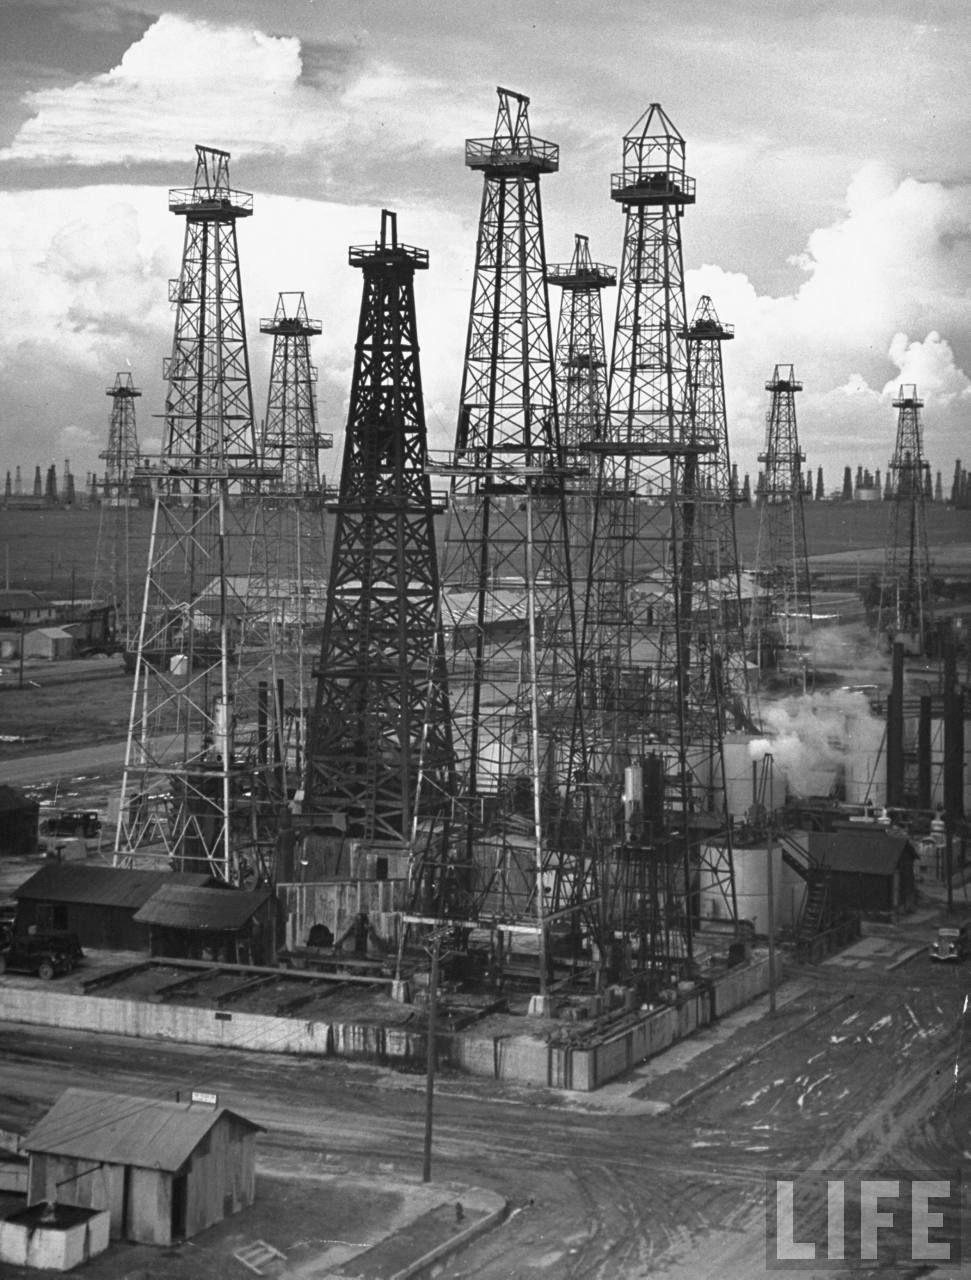 Oil wells near Los Angeles, 1937